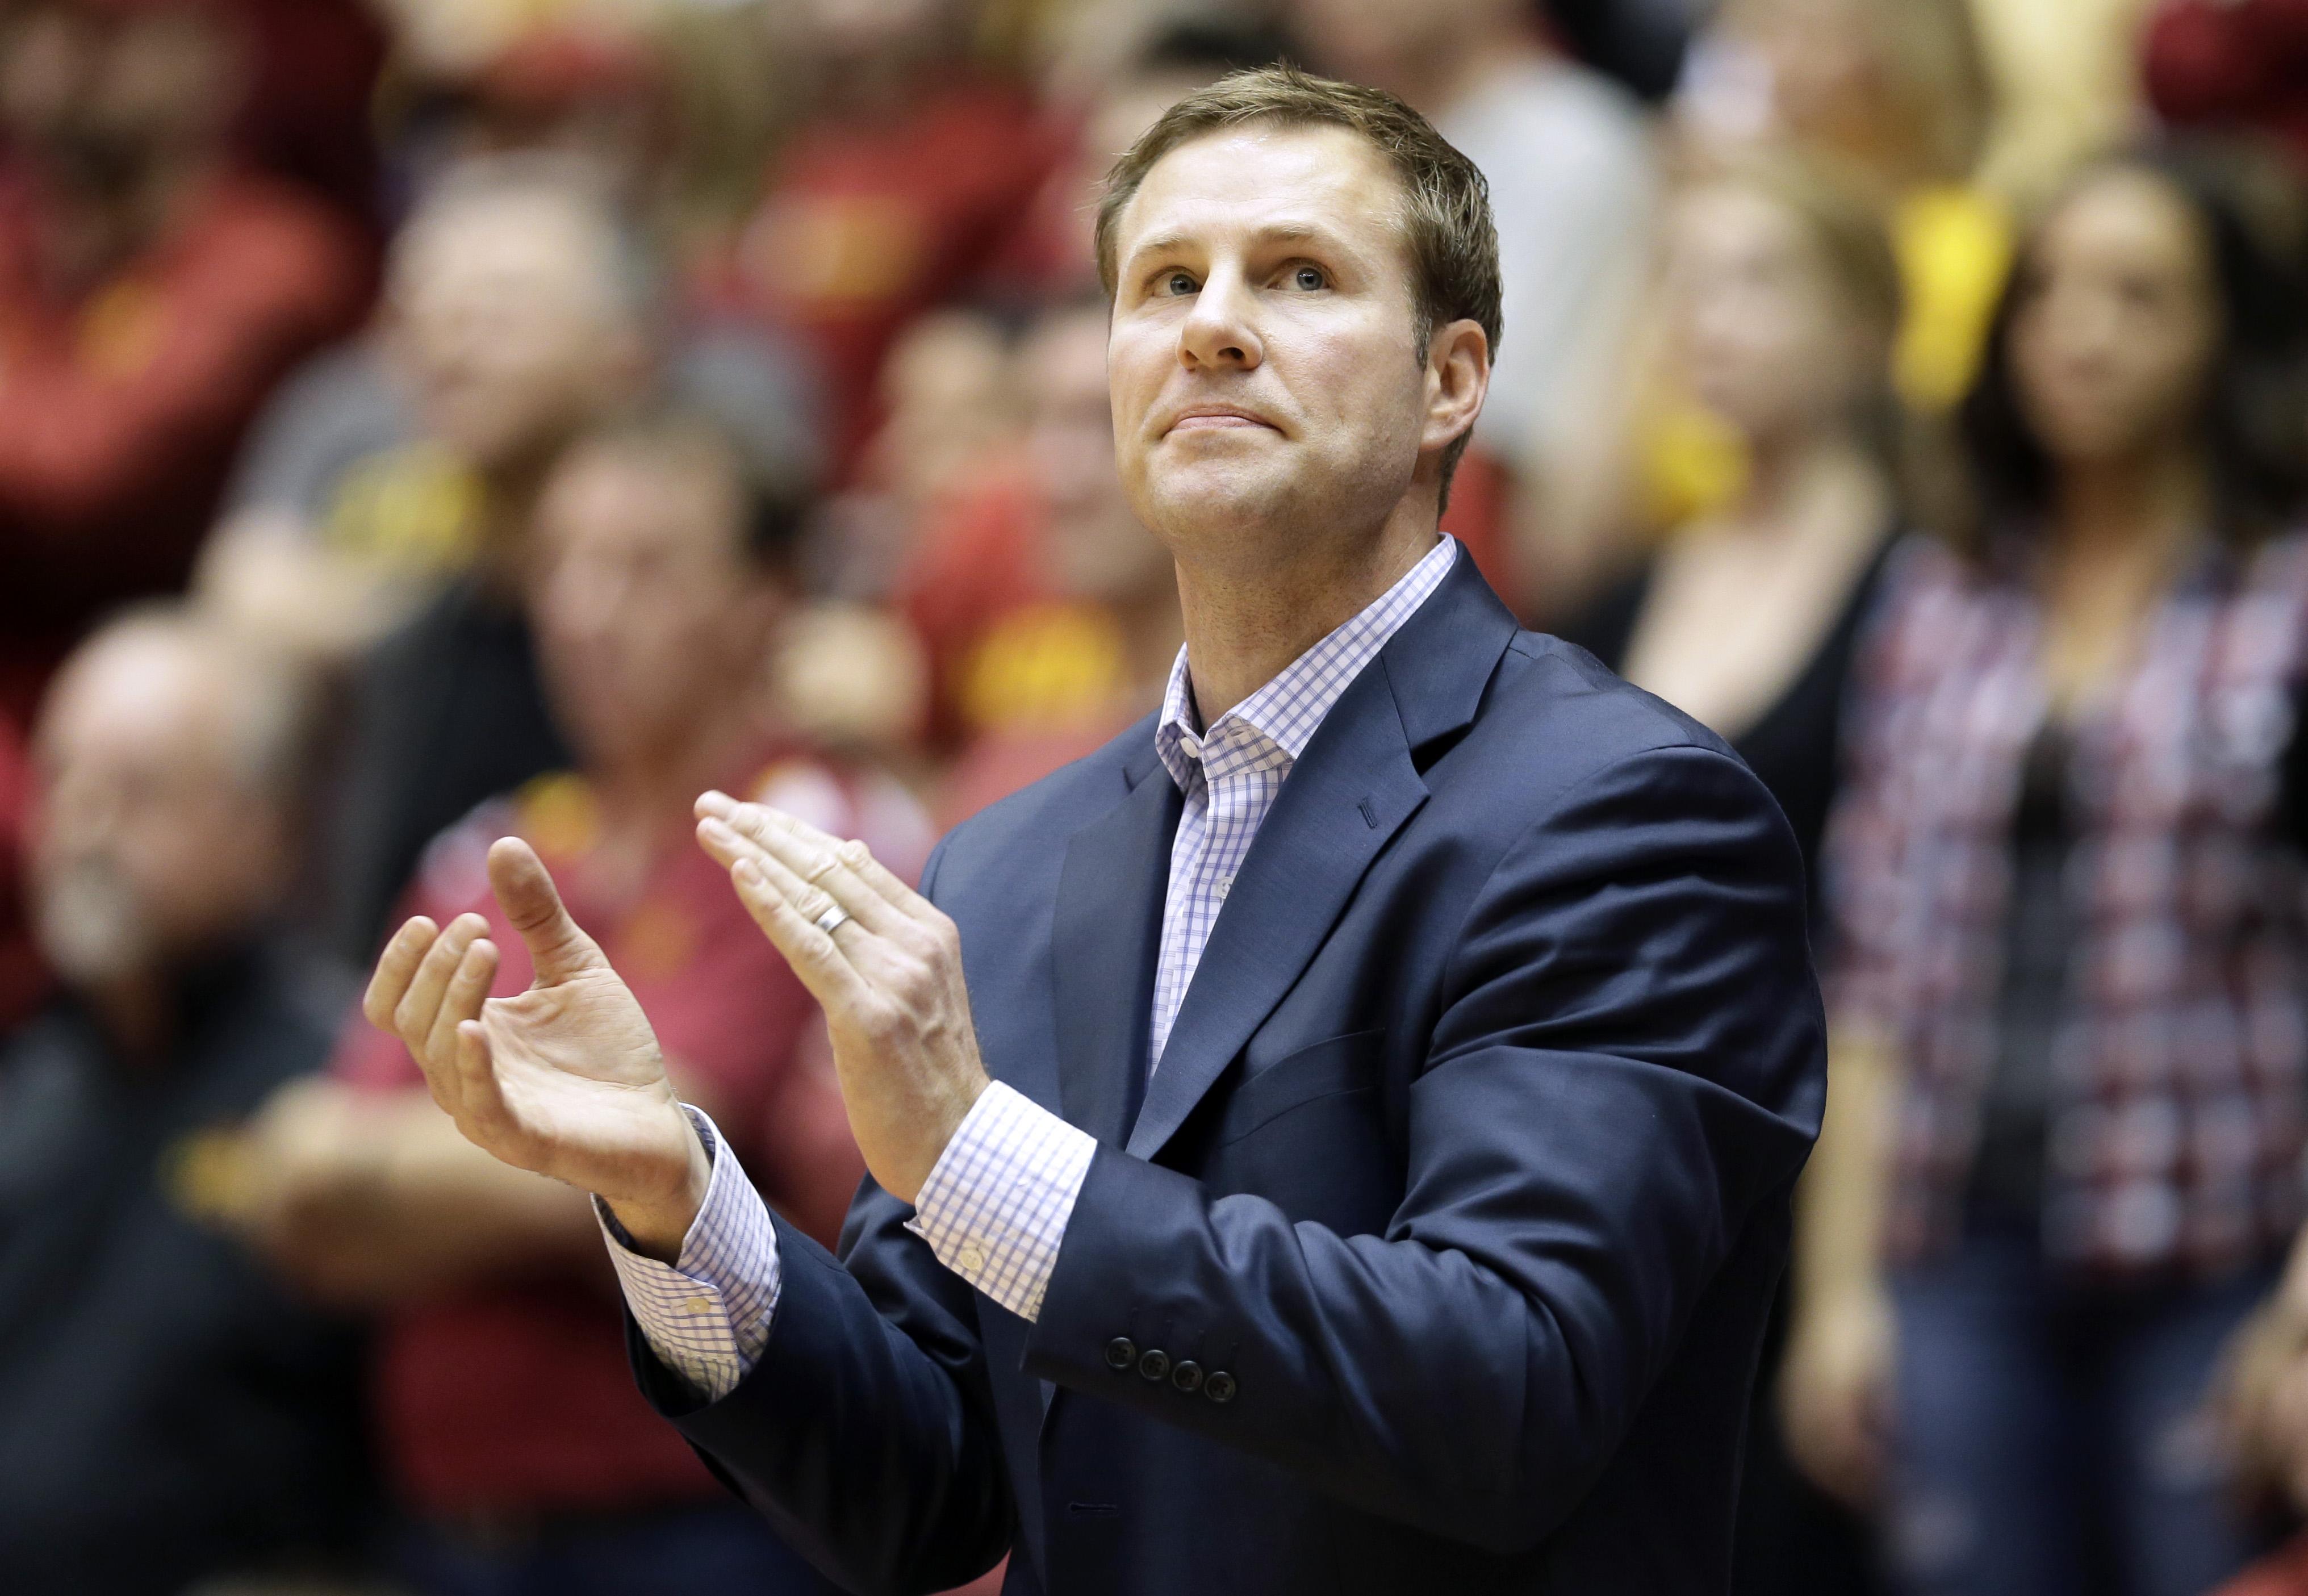 Iowa State basketball coach Fred Hoiberg has heart surgery